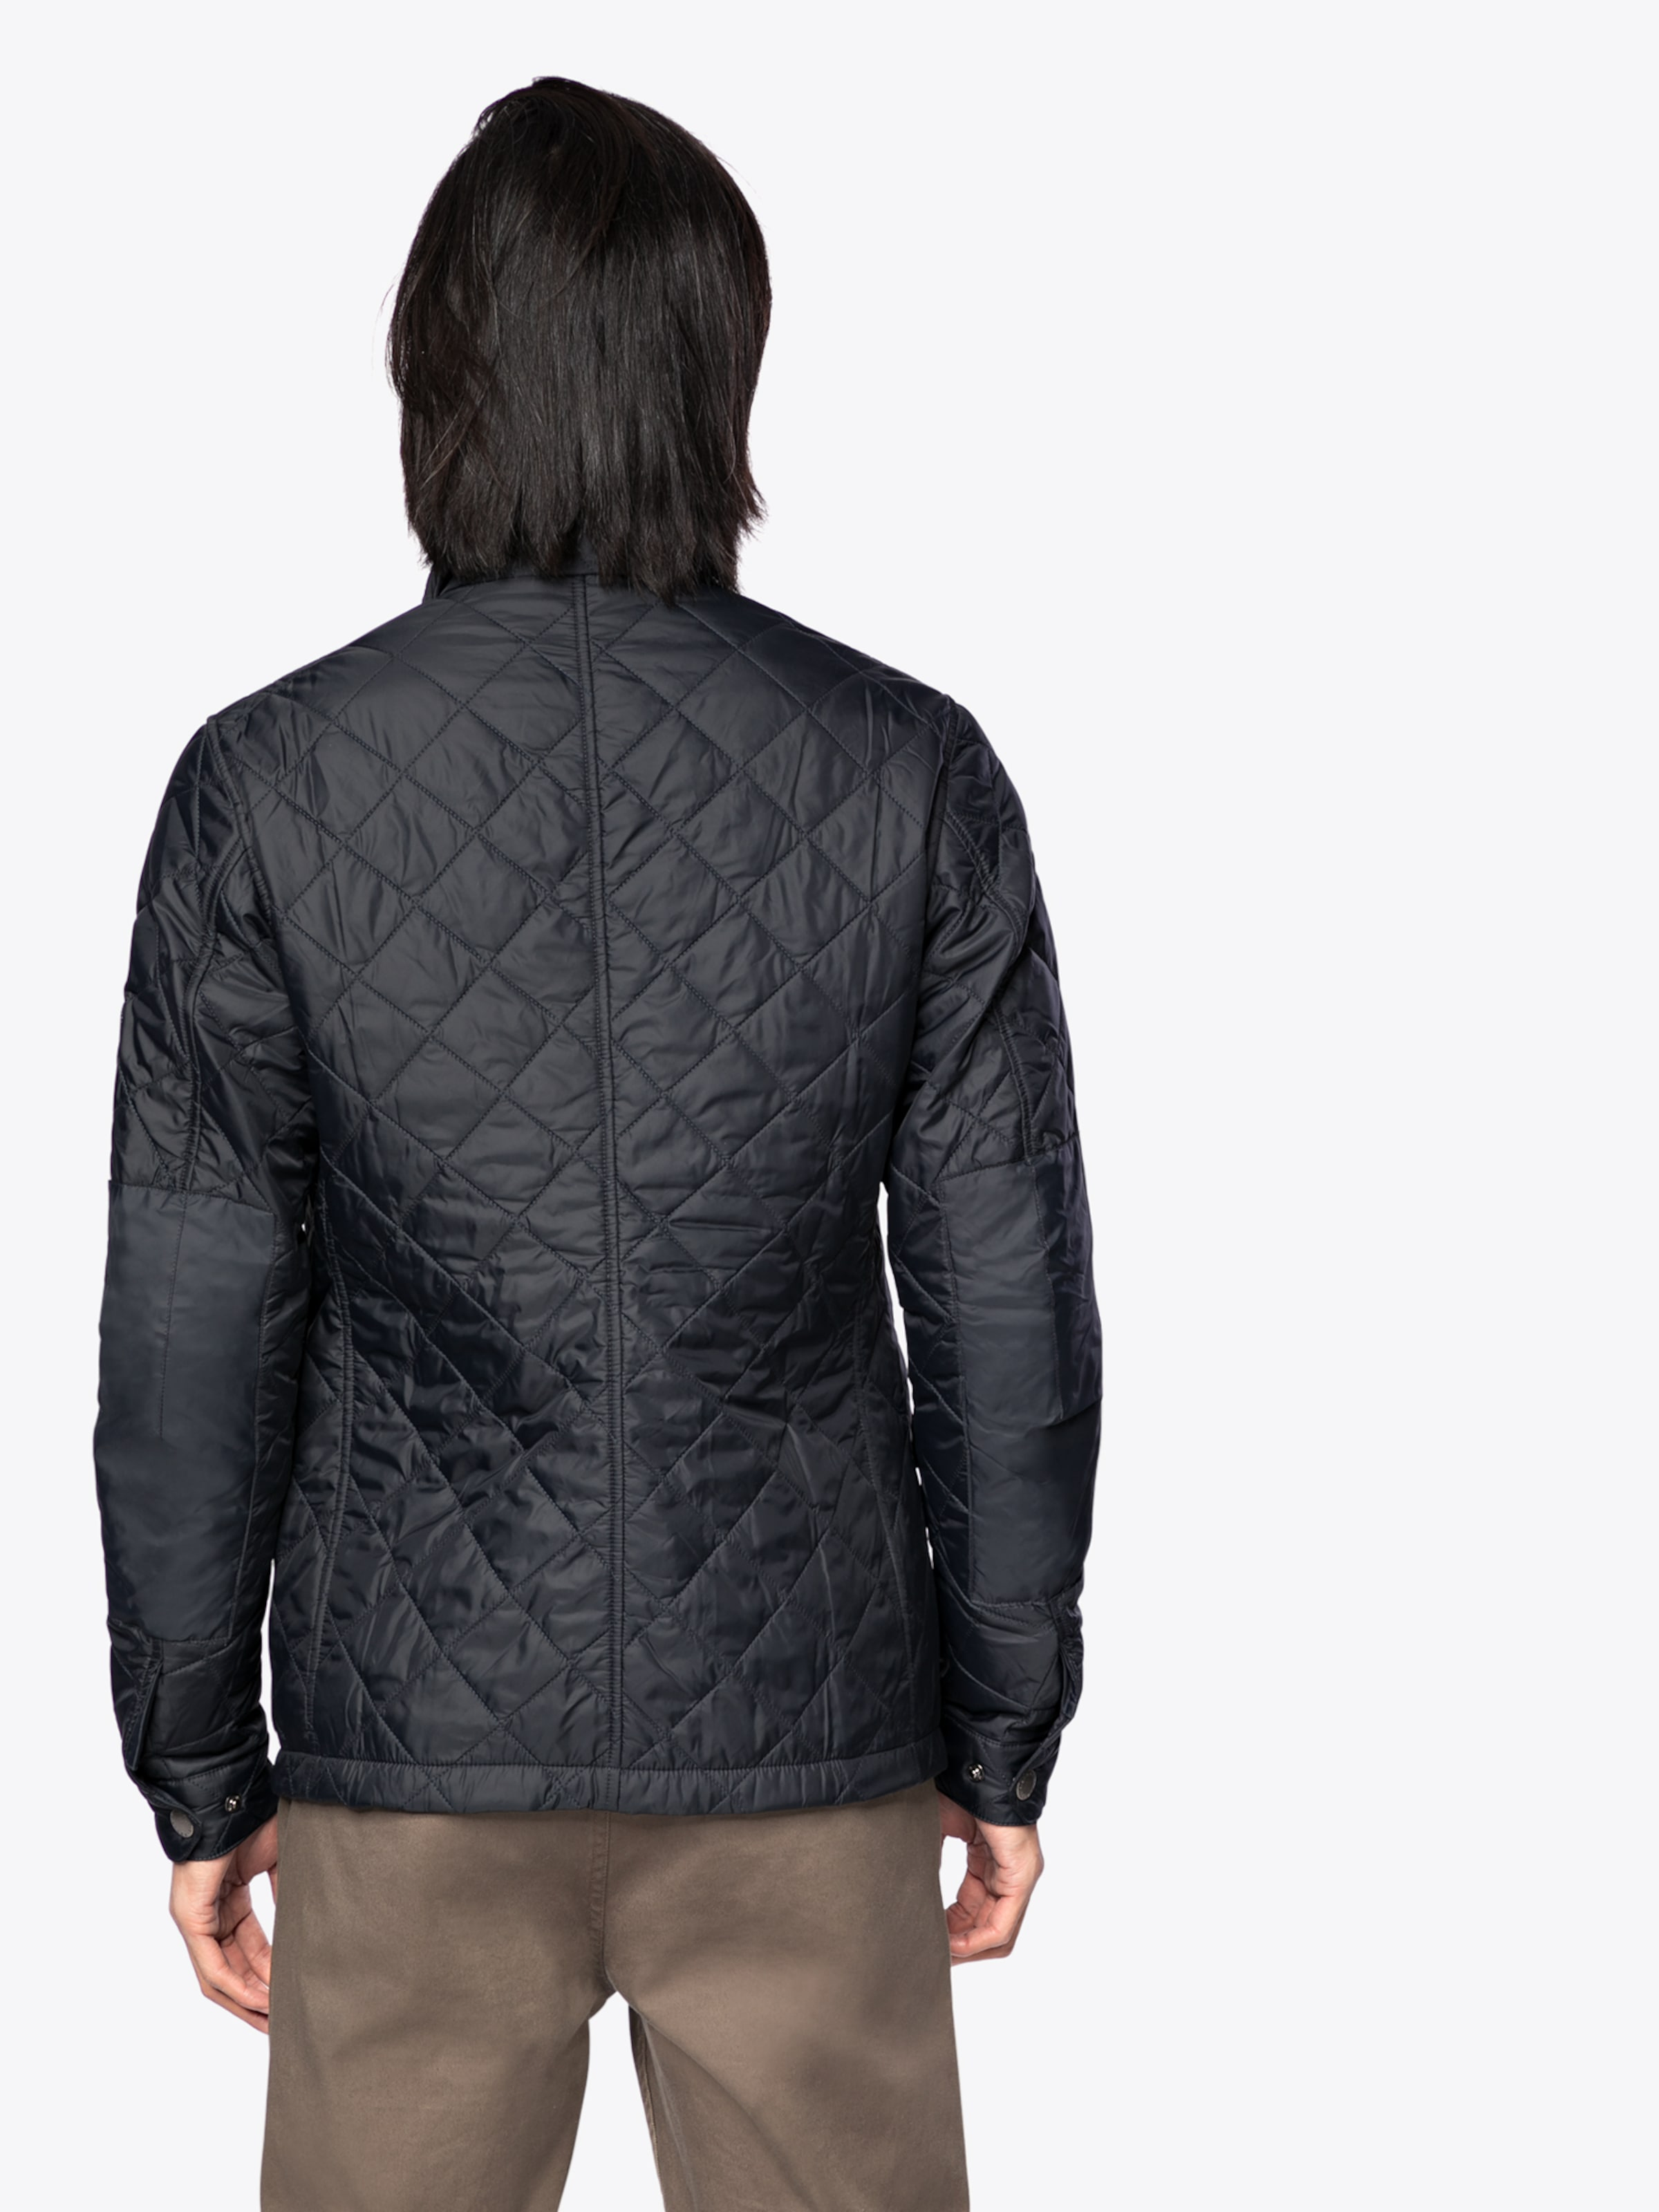 Echt Barbour International Übergangsjacke 'B. Intl Ariel Quilt' Zum Verkauf Rabatt Verkauf Verkauf Manchester Großer Verkauf CzAiPQL